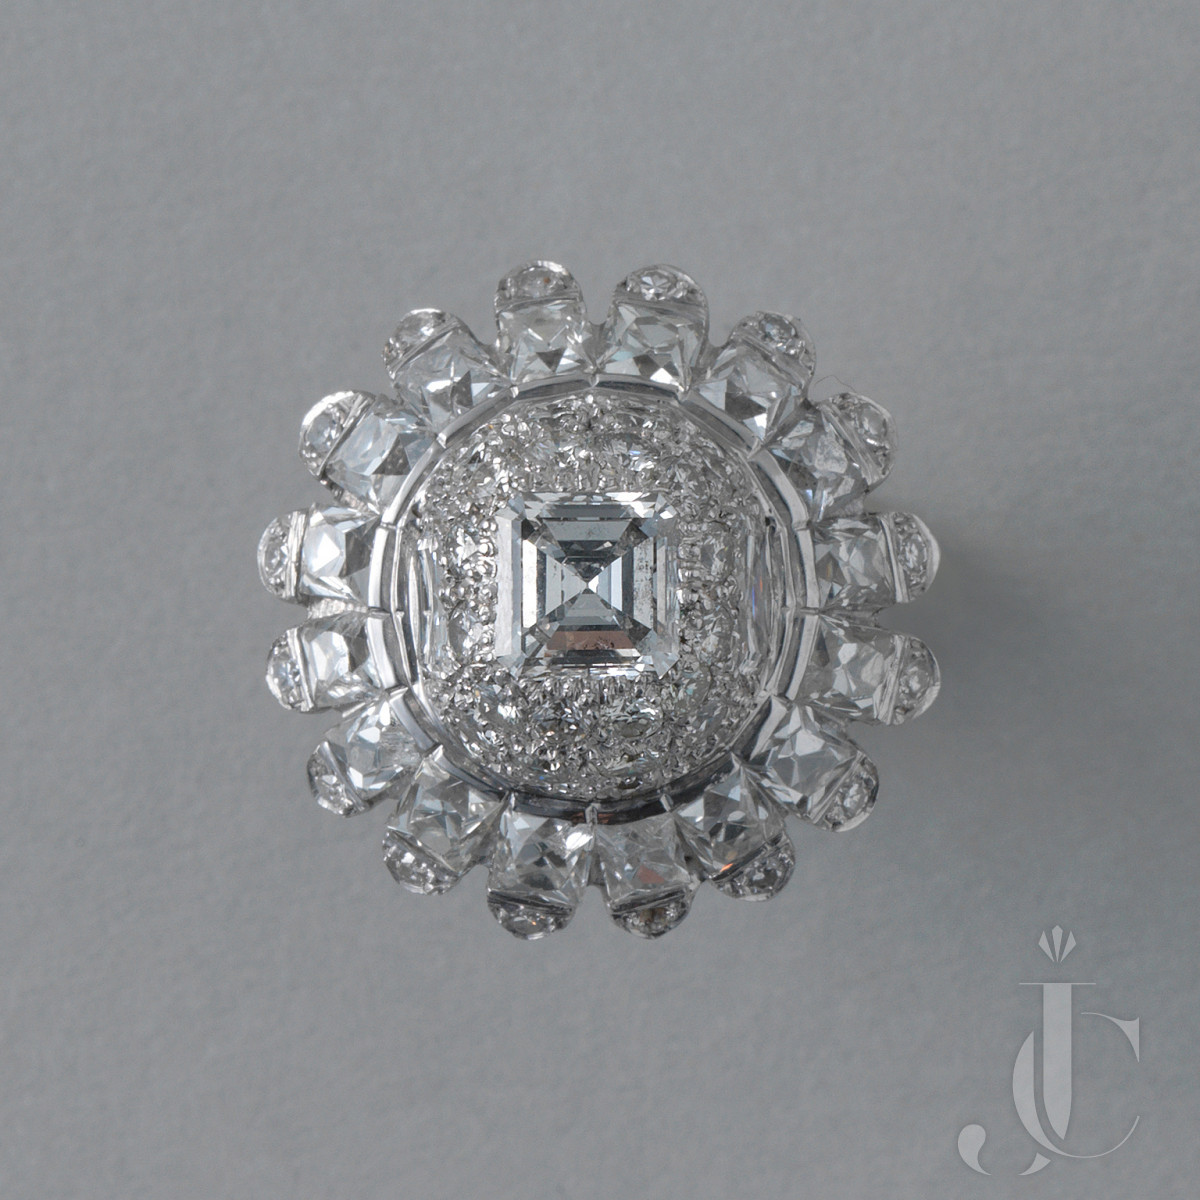 PLATINUM AND DIAMOND 1950s COCKTAIL RING